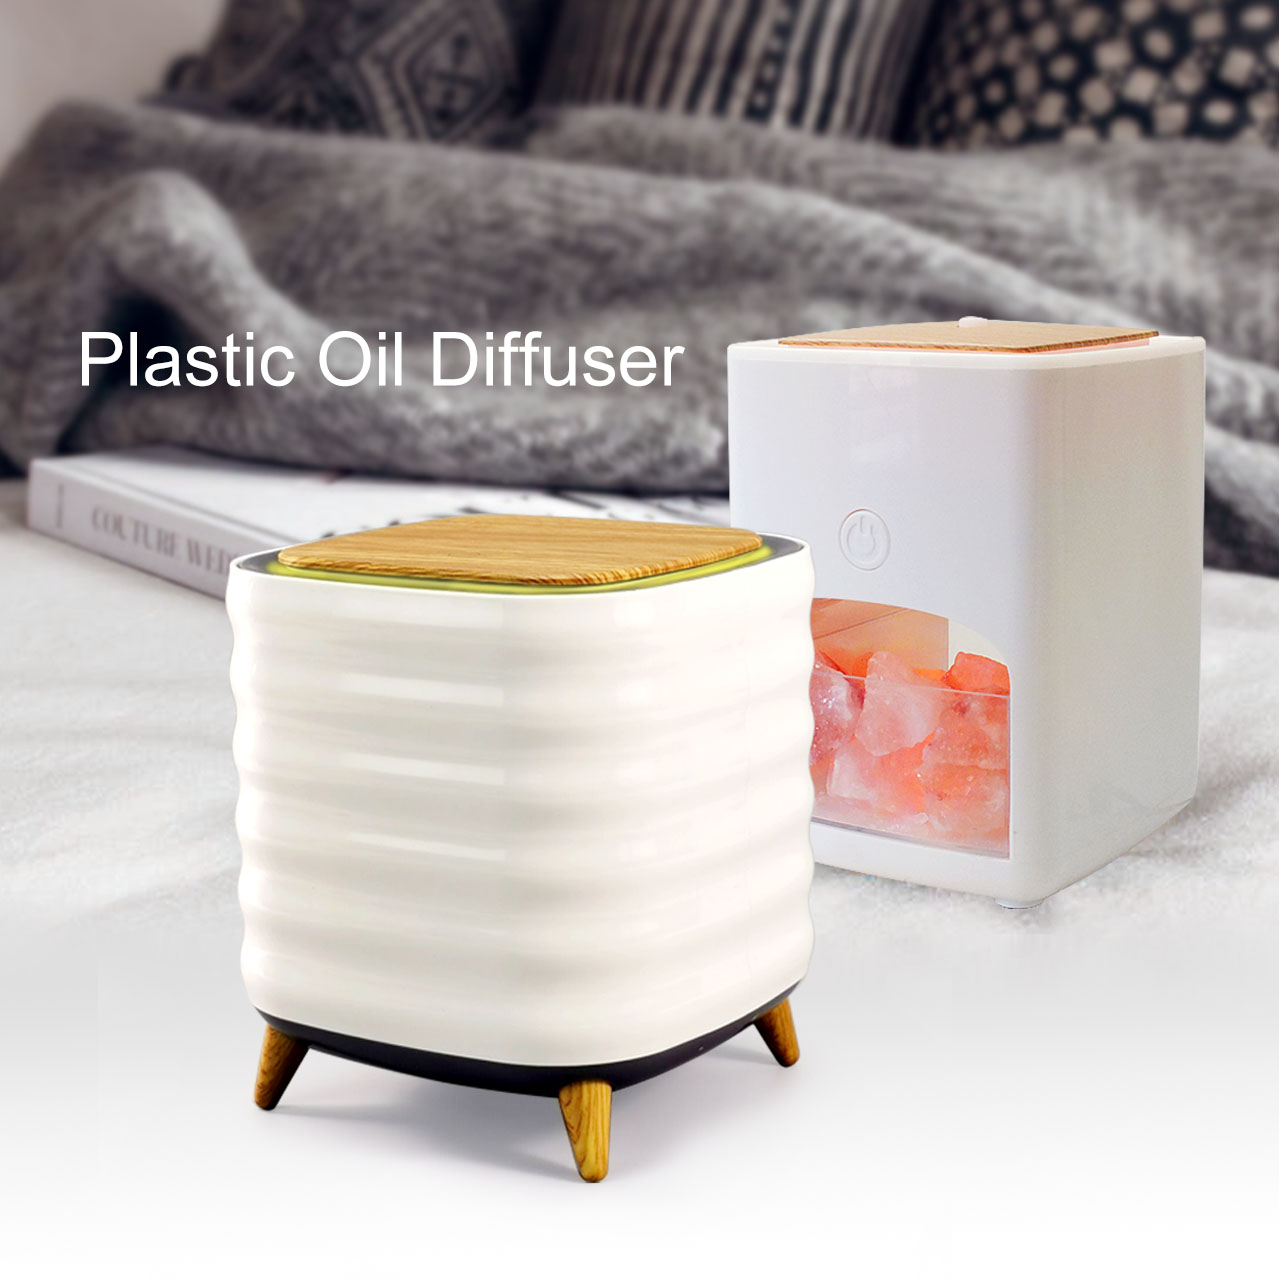 Plastic-oil-diffuser